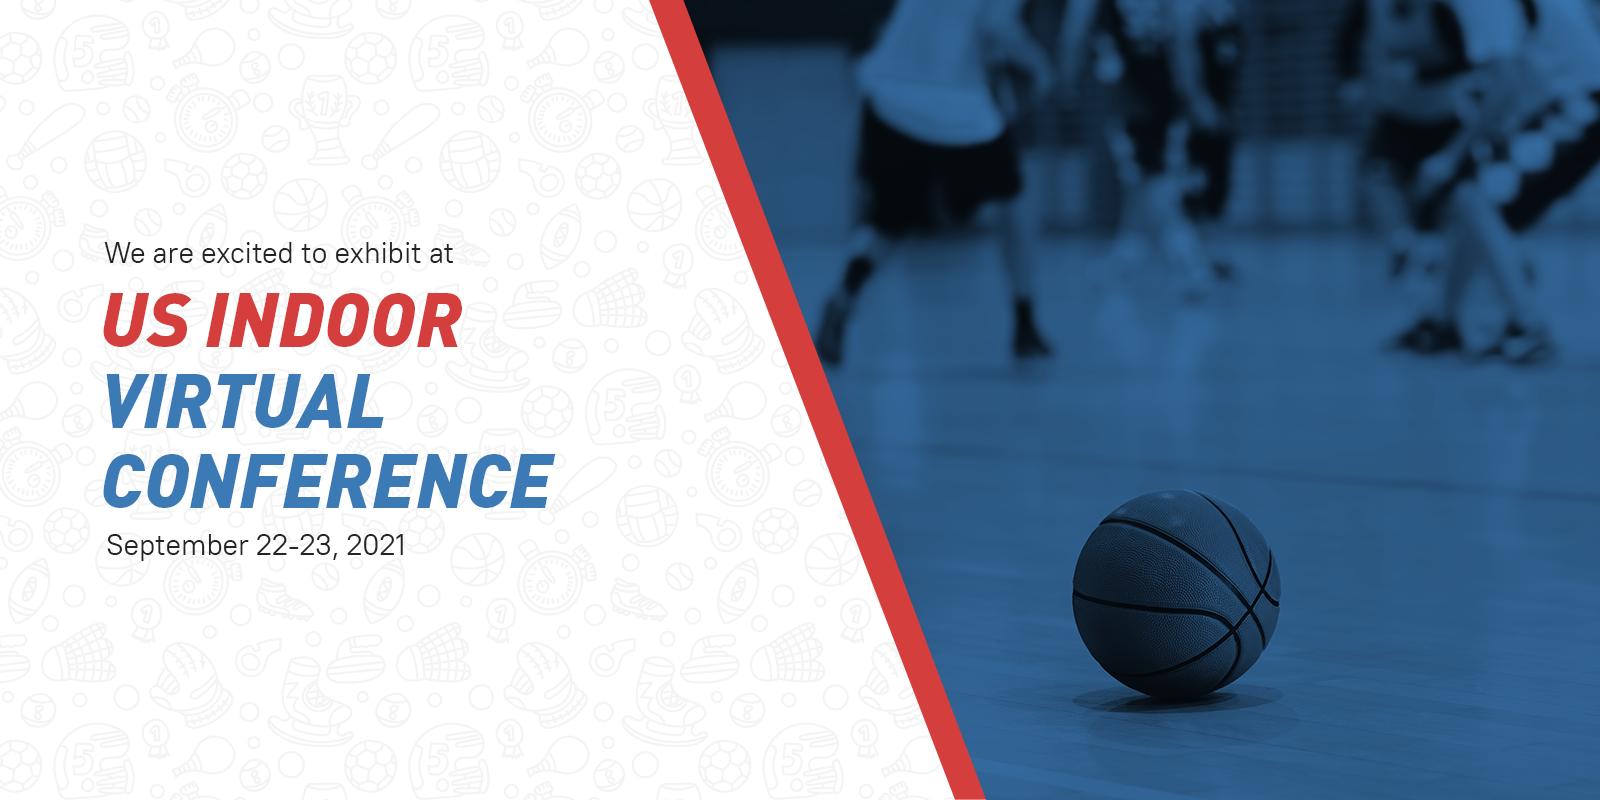 US Indoor Virtual Conference